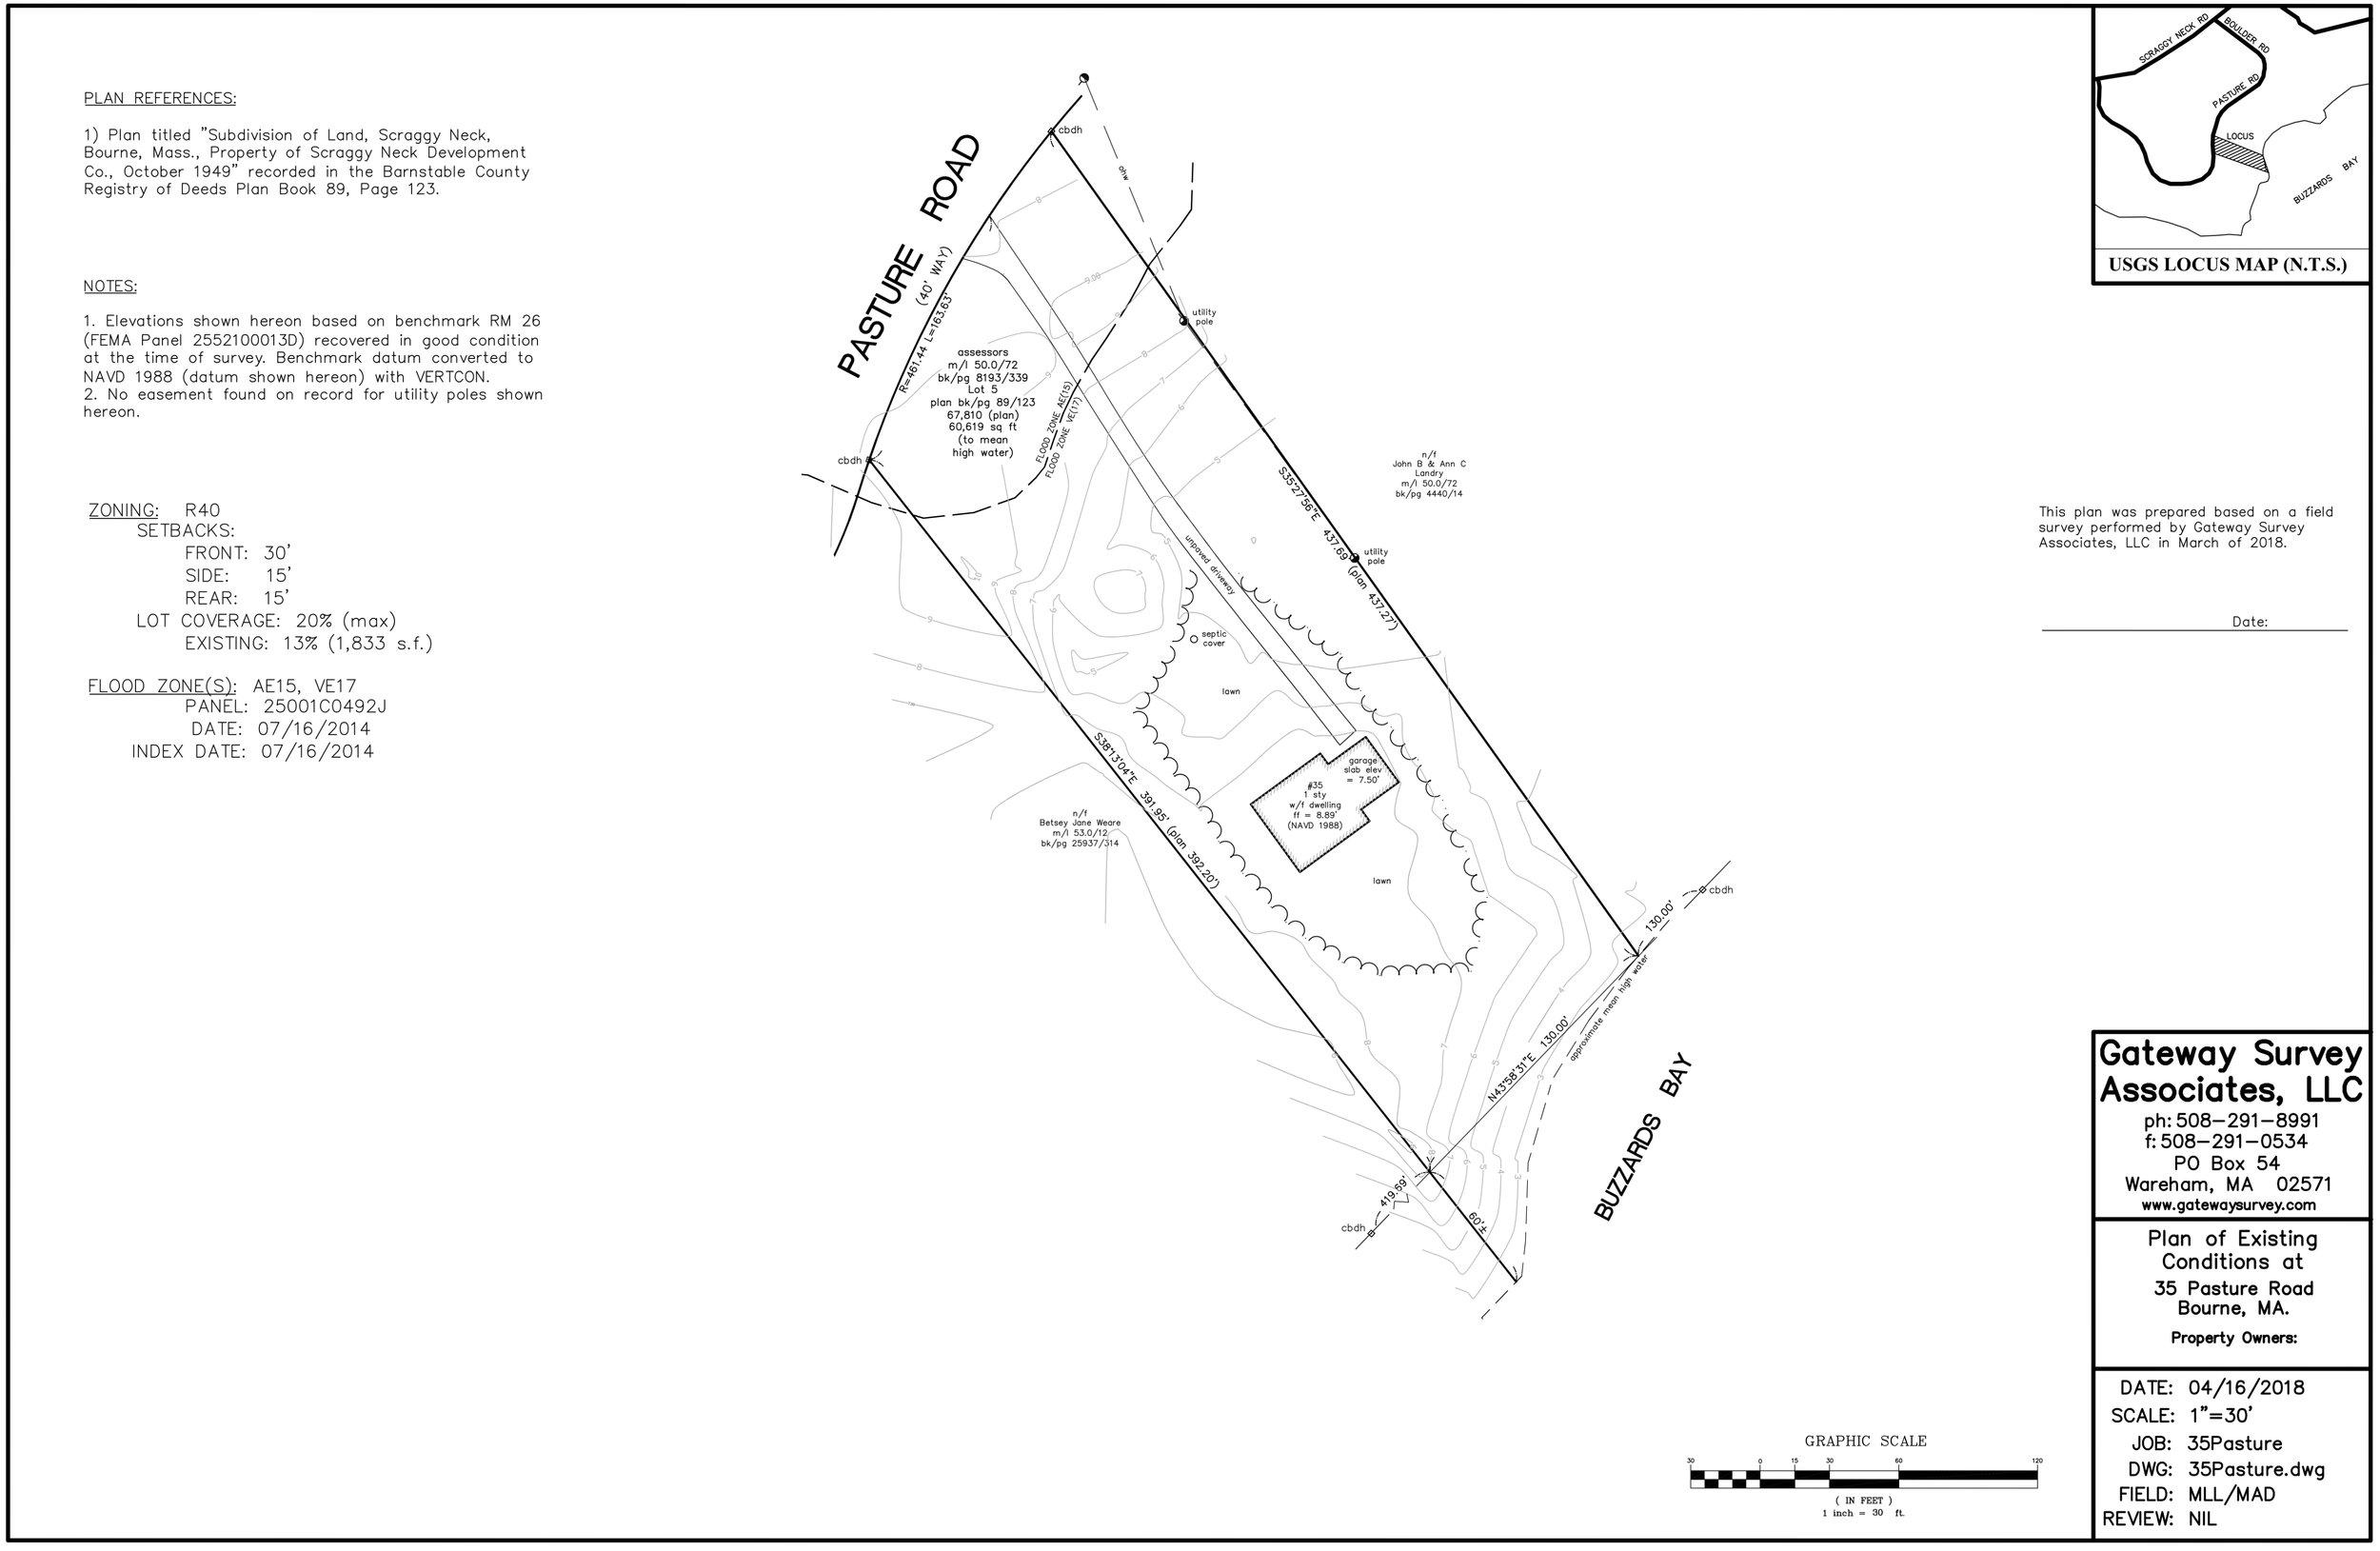 2018-04-16 - 35 pasture ln pilon existing conditions plan.jpg